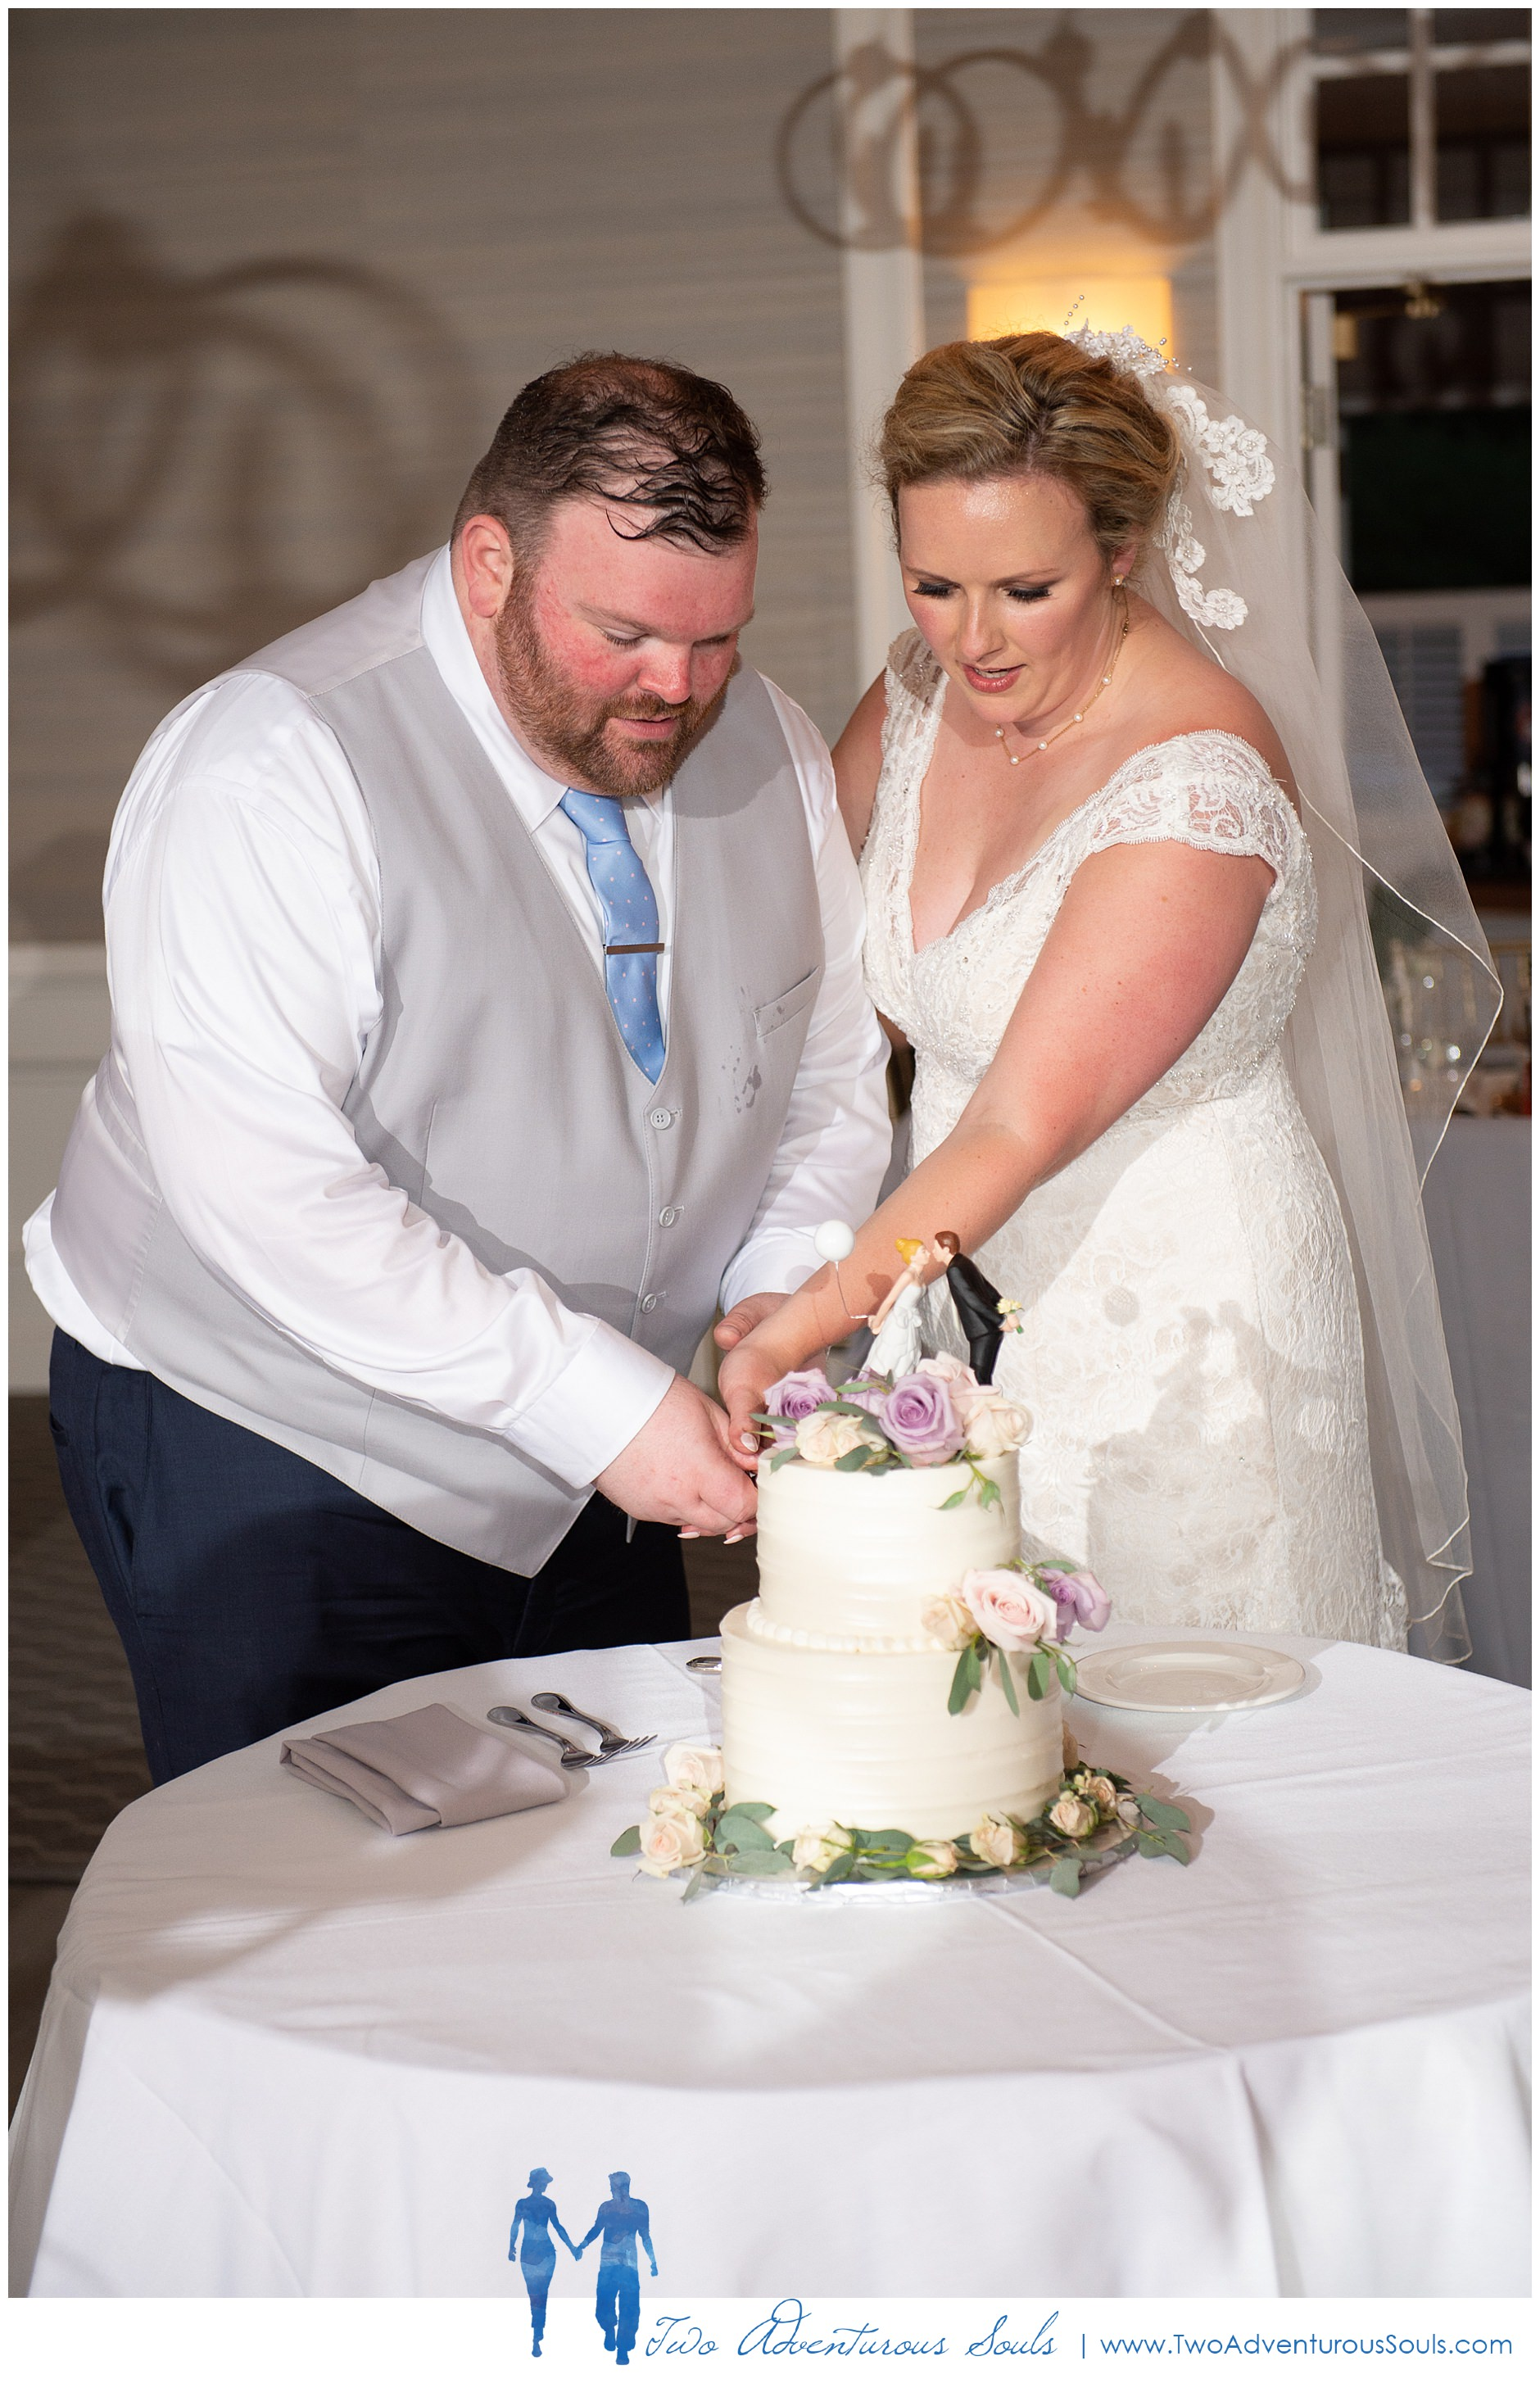 Cape Cod Wedding Photographers, Destination Wedding Photographers, Two Adventurous Souls-081019_0047.jpg